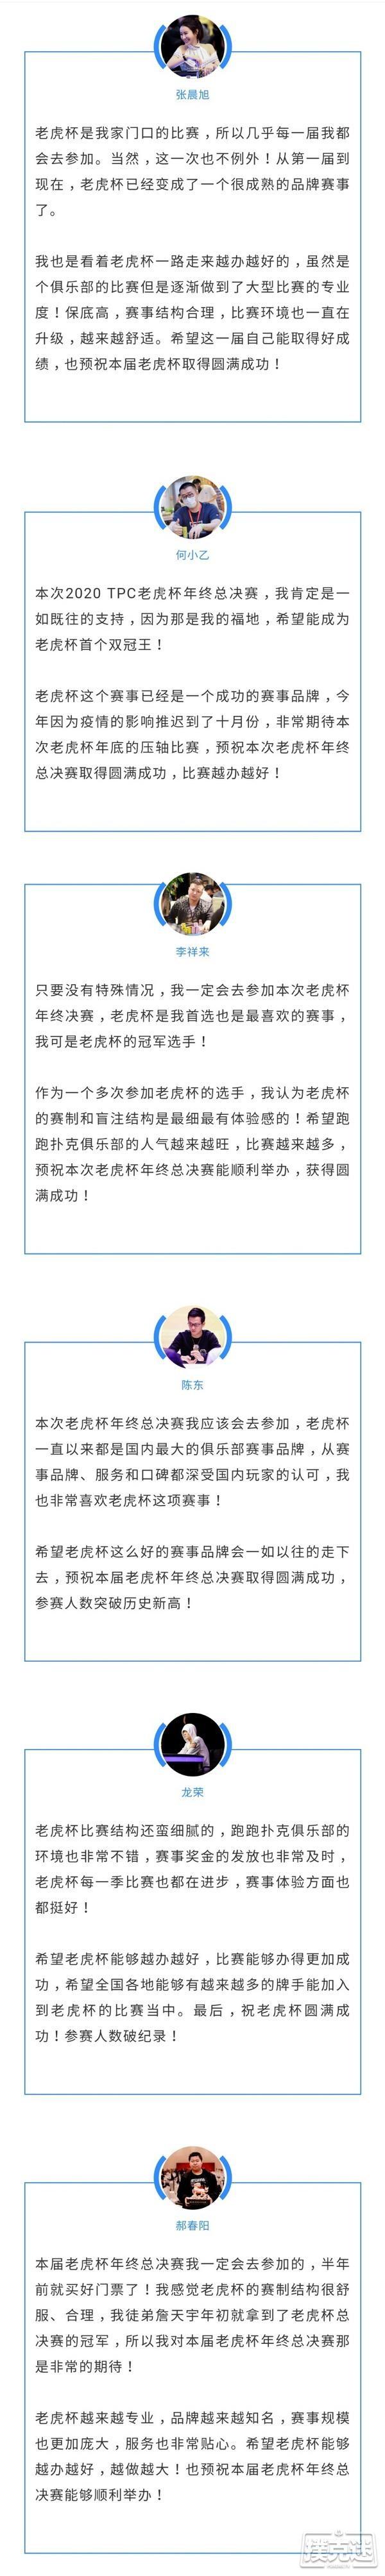 【6upoker】众星璀璨!明星牌手祝福2020 TPC老虎杯年终总决赛!